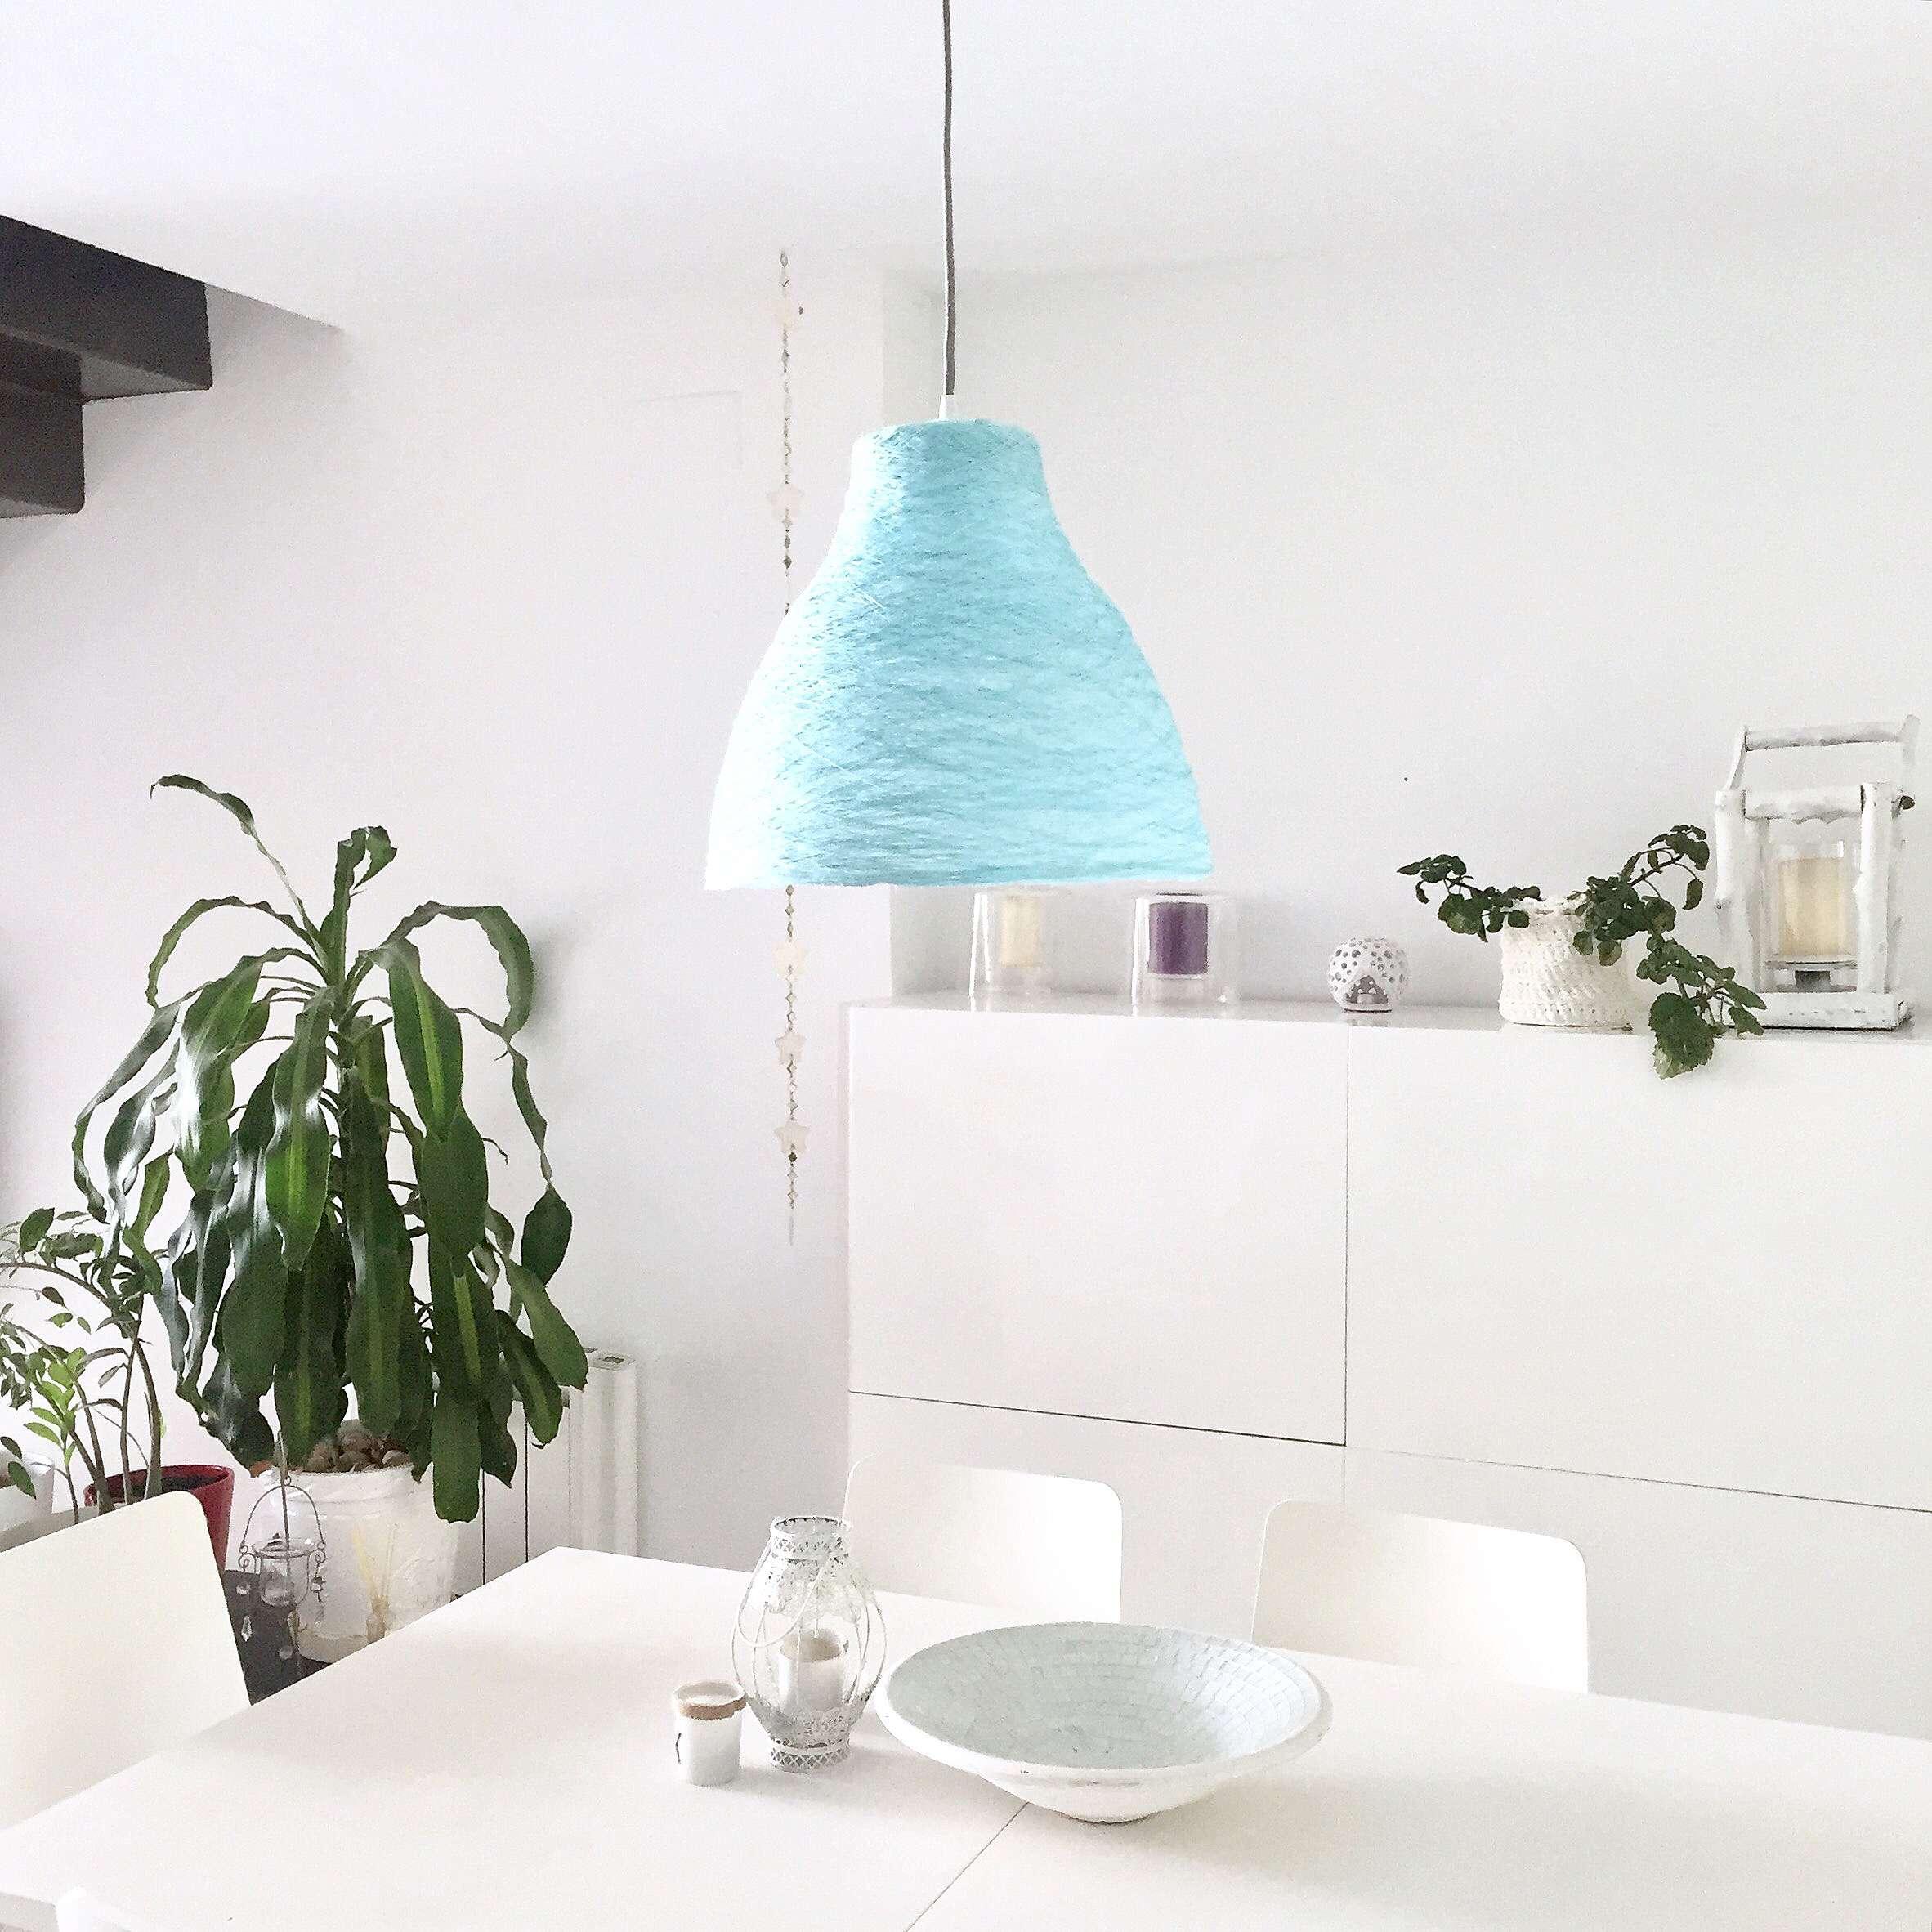 L mpara de techo dise o escandinavo ocean geometrik design for Lamparas de diseno italiano